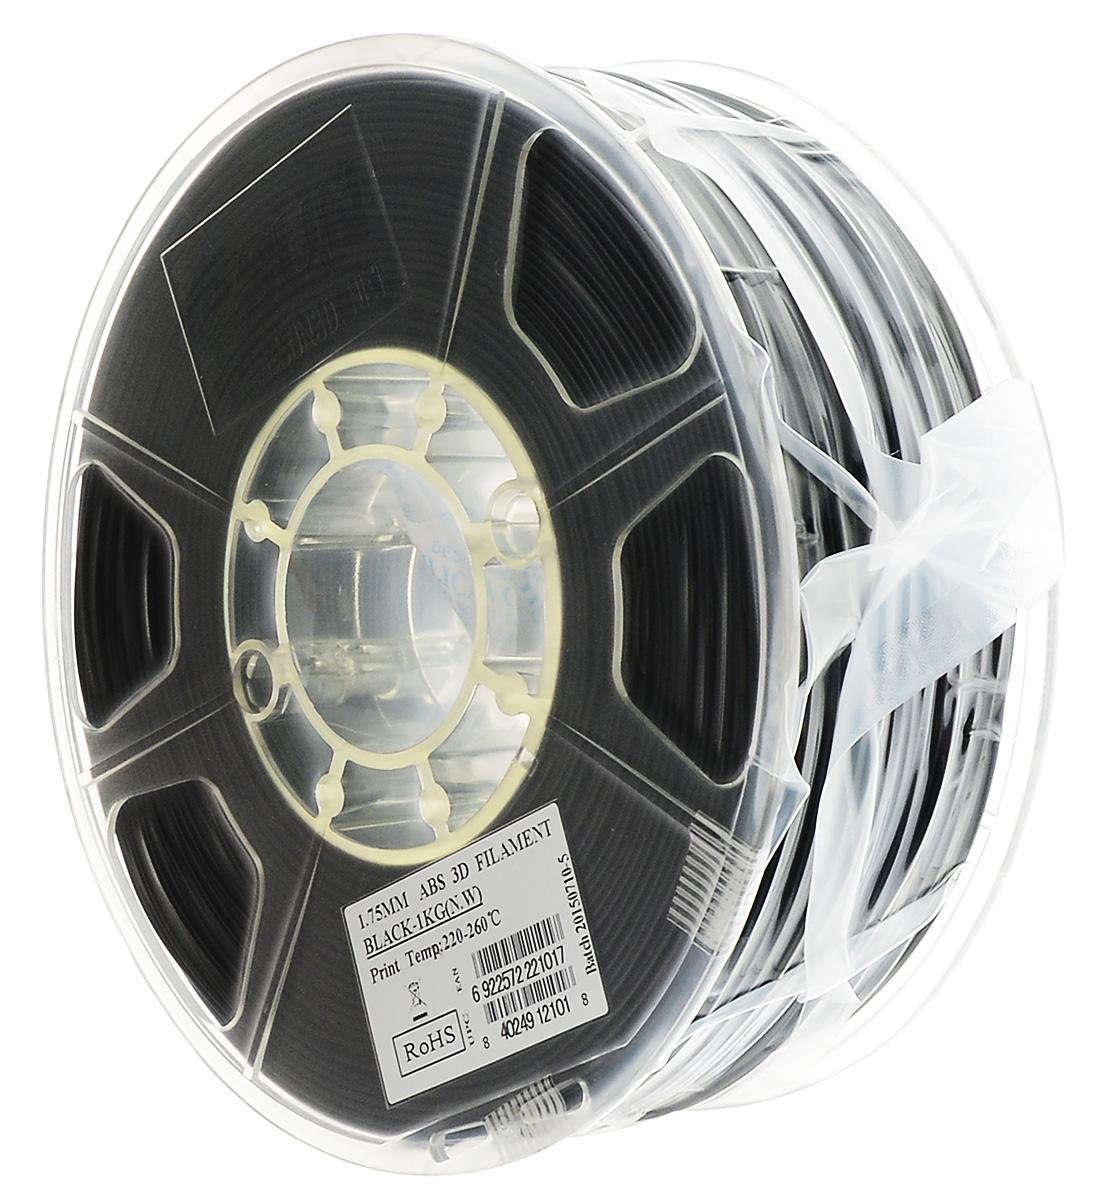 ESUN пластик ABS в катушке, Black, 1,75 ммABS175B1ESUN ABS175B1 - катушка ABS-пластика черного цвета для 3D печати. Толщина пластика составляет 1,75 мм.